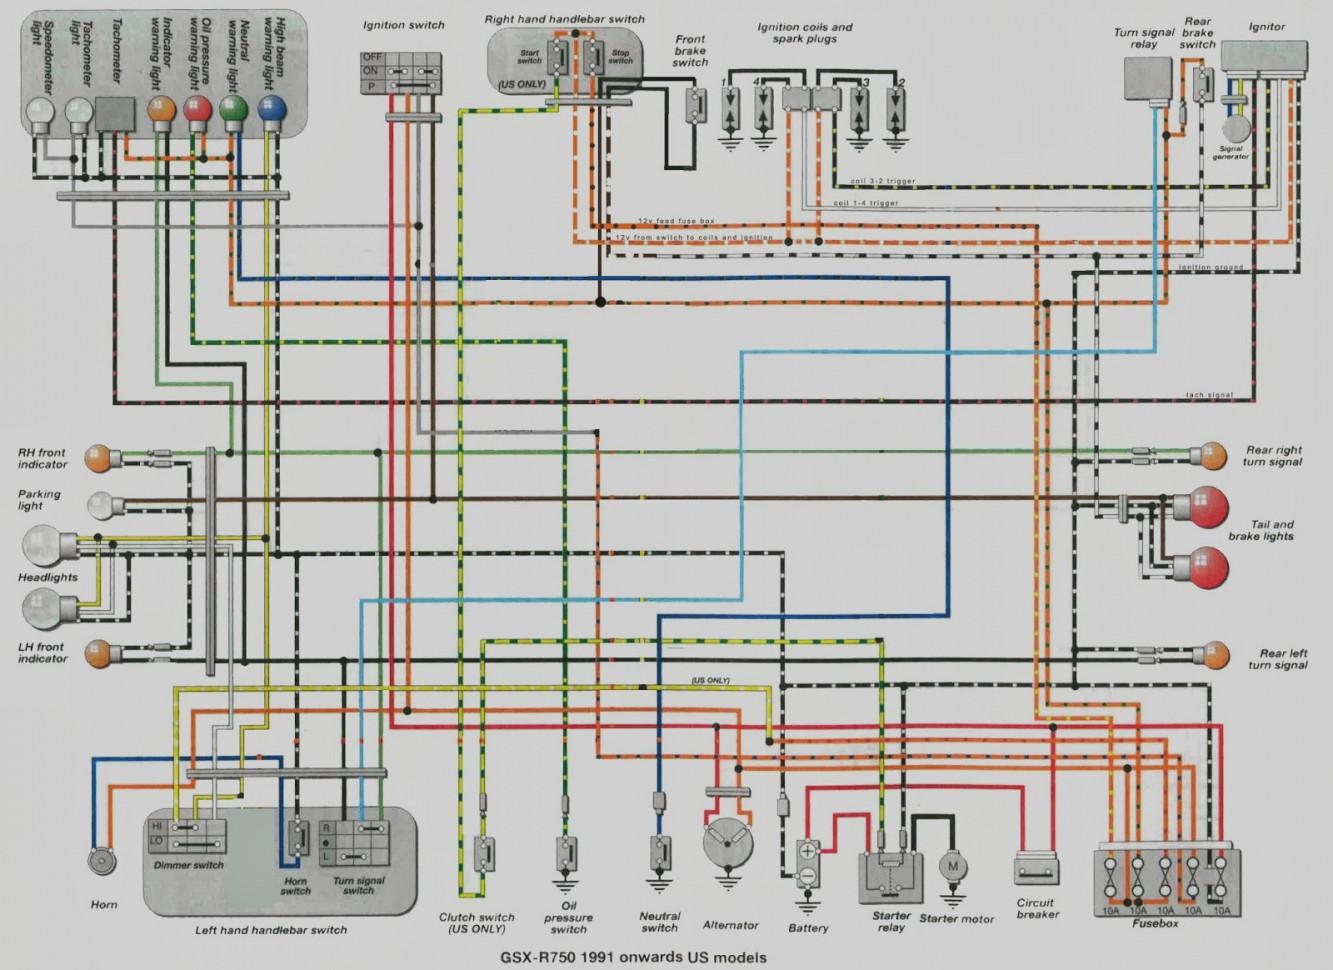 ZM_3774] Ltr450 Wiring Diagram Schematic WiringMonoc Mentra Retr Hopad Scata Sulf Lopla Funi Wigeg Mohammedshrine Librar  Wiring 101